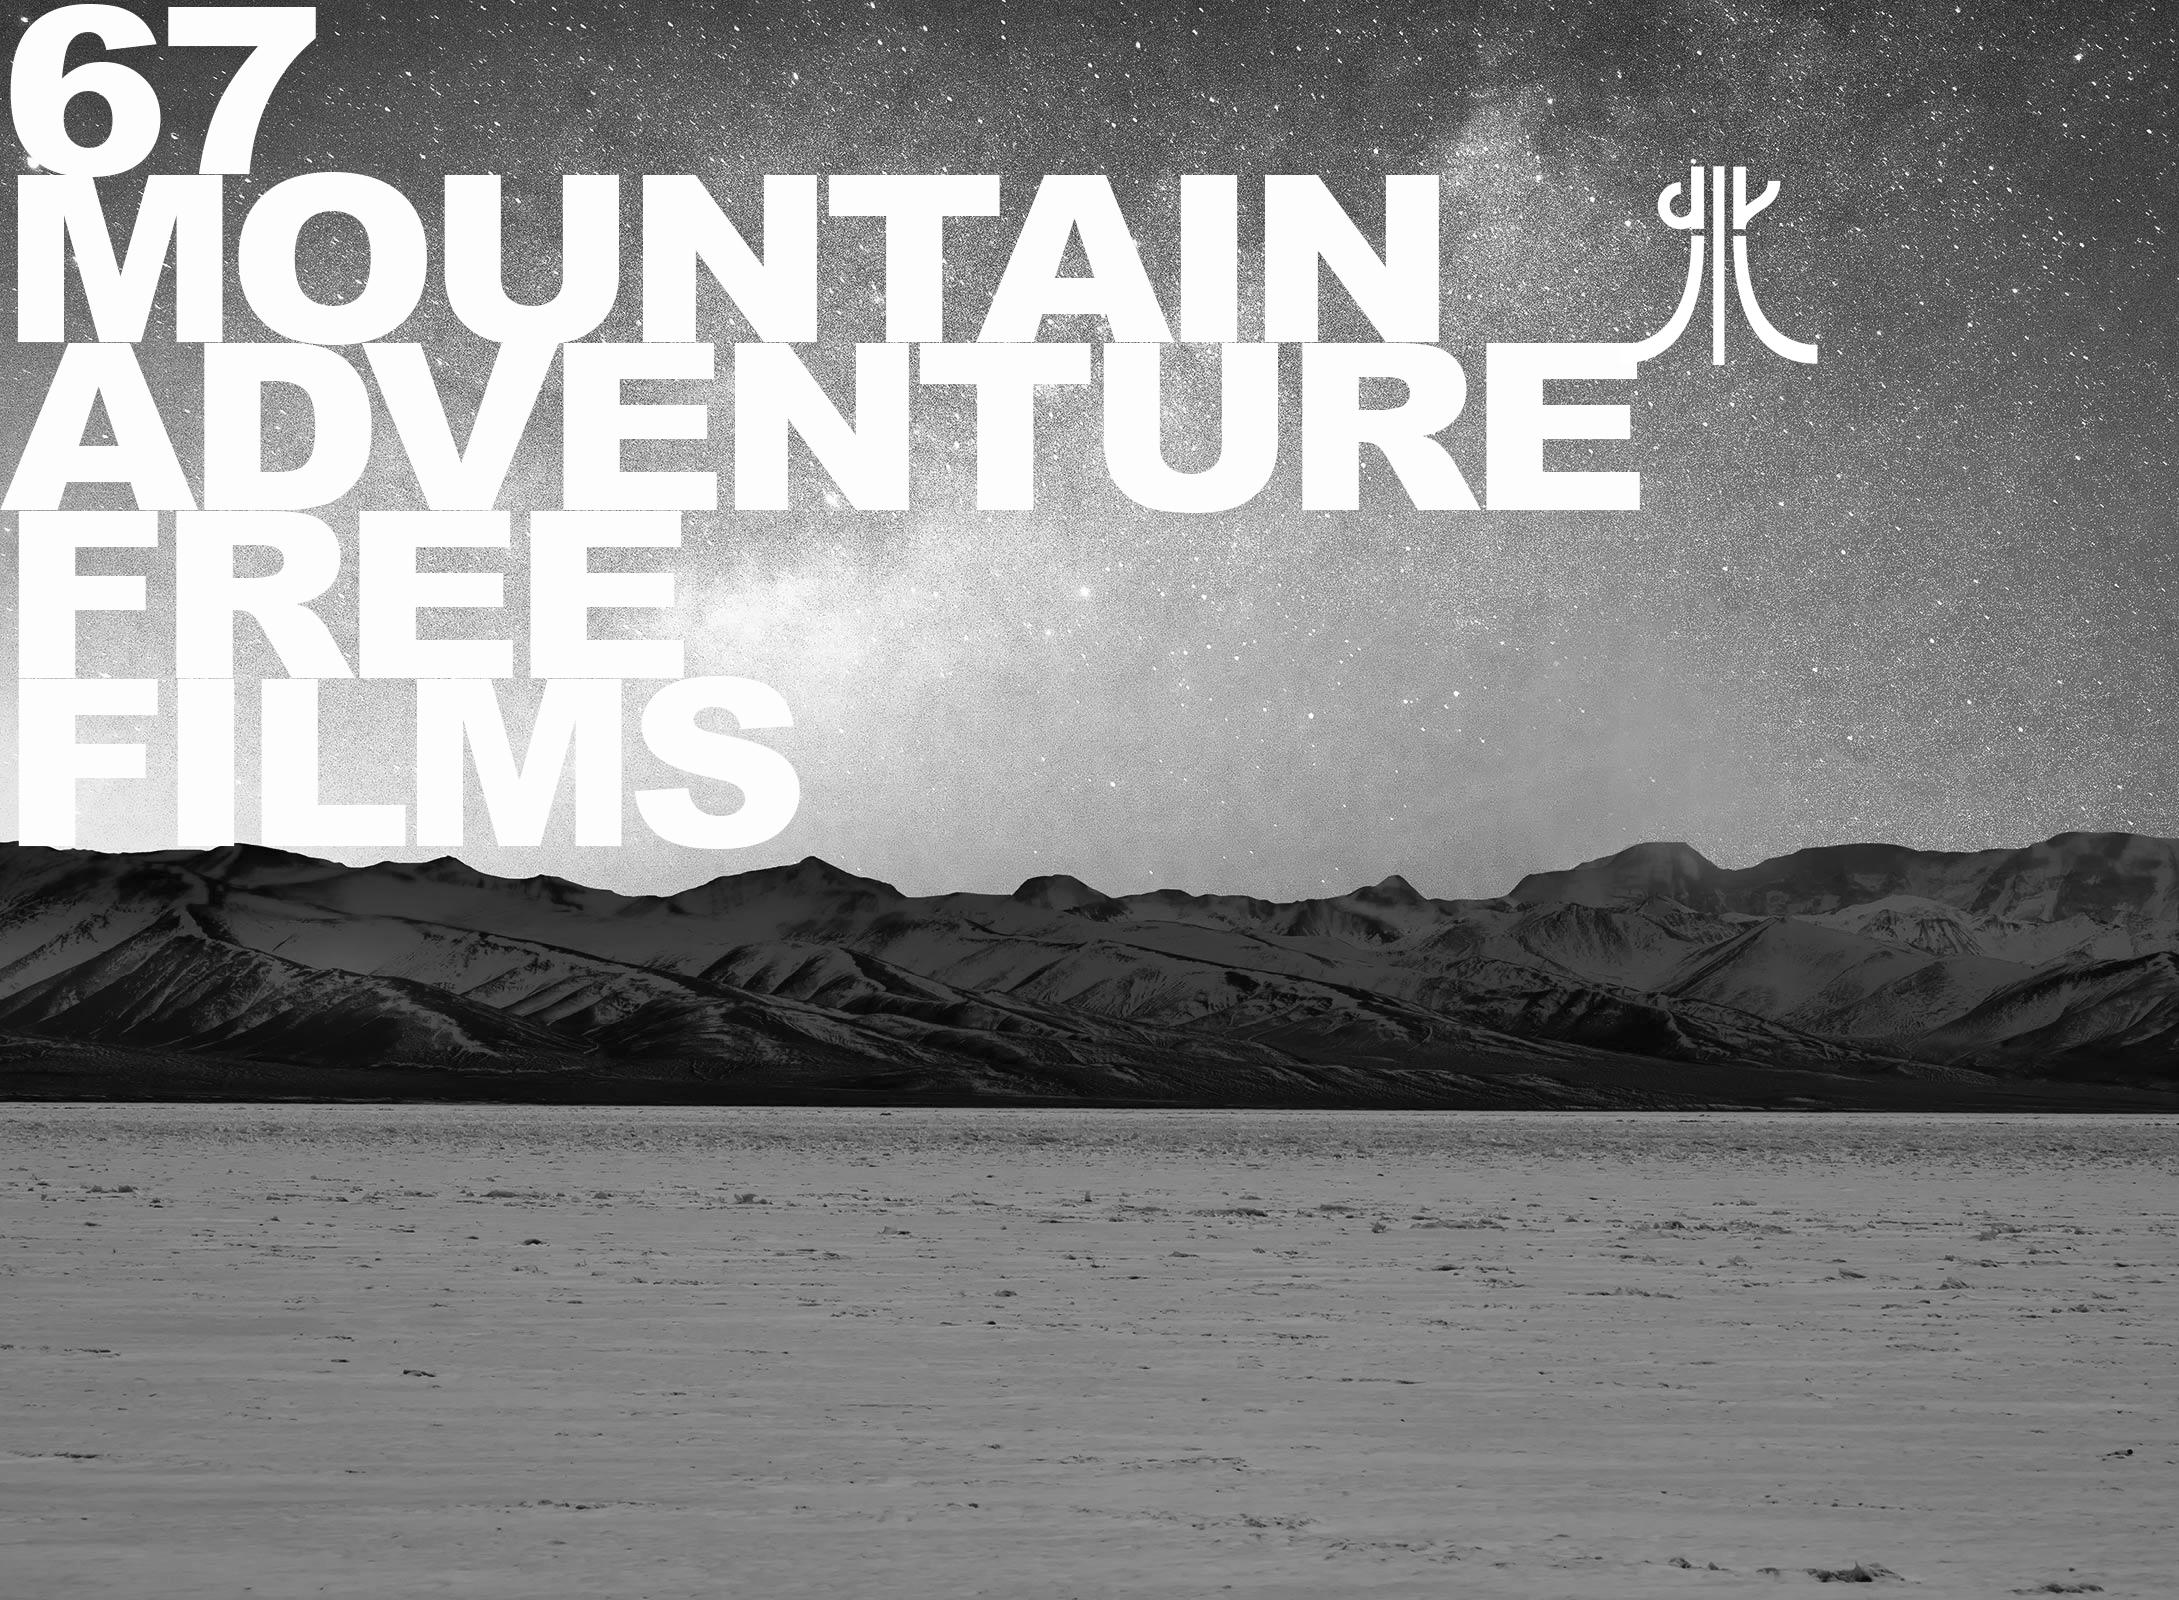 100 free film di avventura montagna concessi da Banff mountain film festival